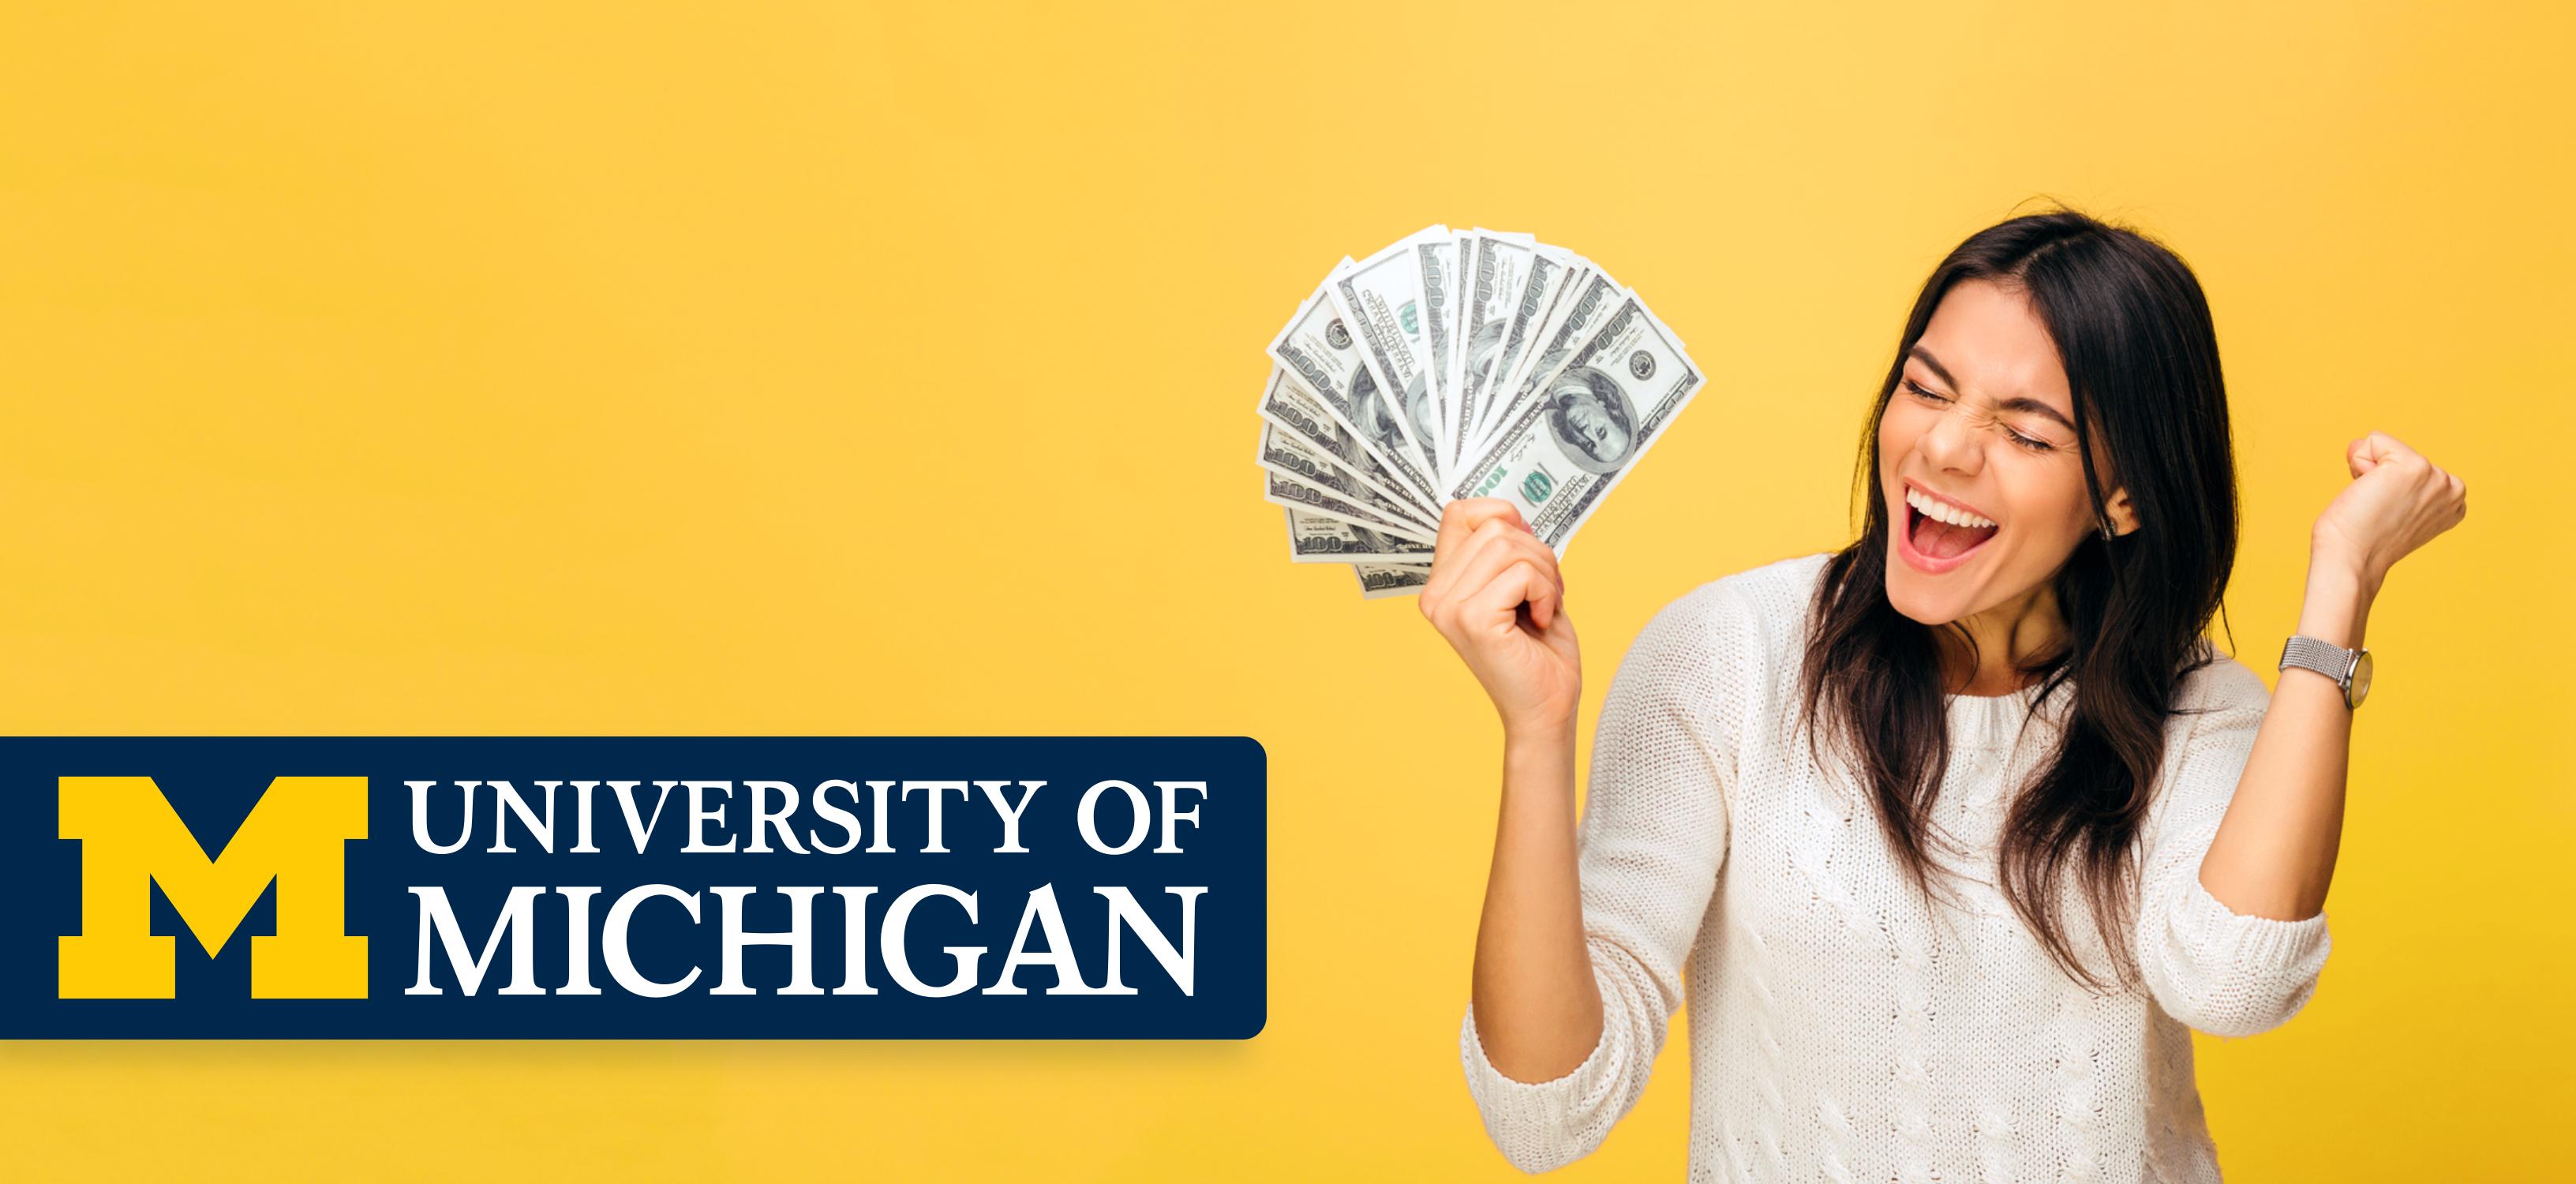 400+ University of Michigan Student Discounts